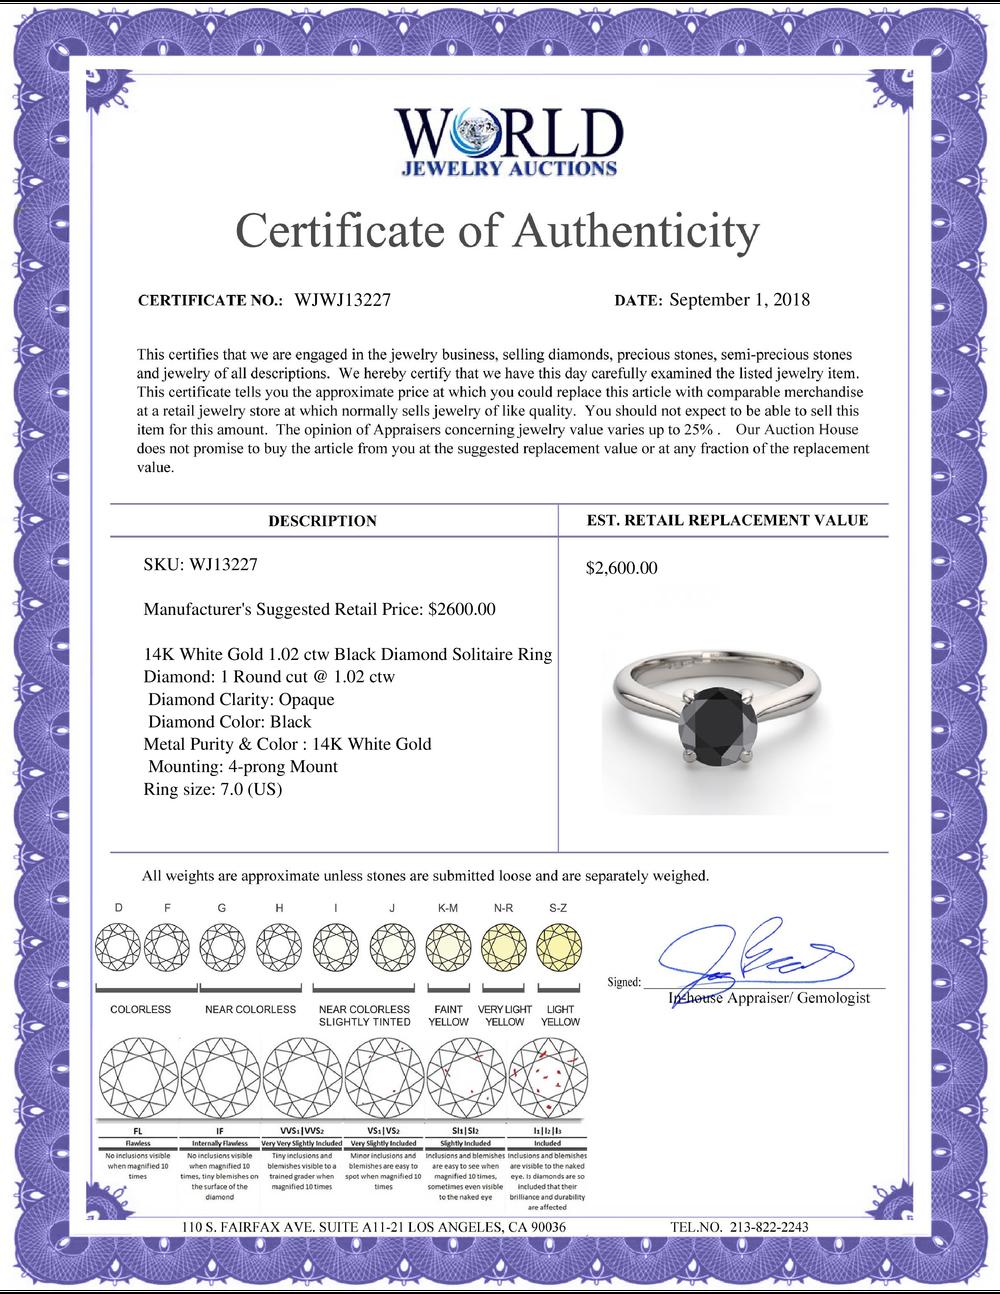 Lot 4096: 14K White Gold 1.02 ctw Black Diamond Solitaire Ring - REF-63N5W-WJ13227